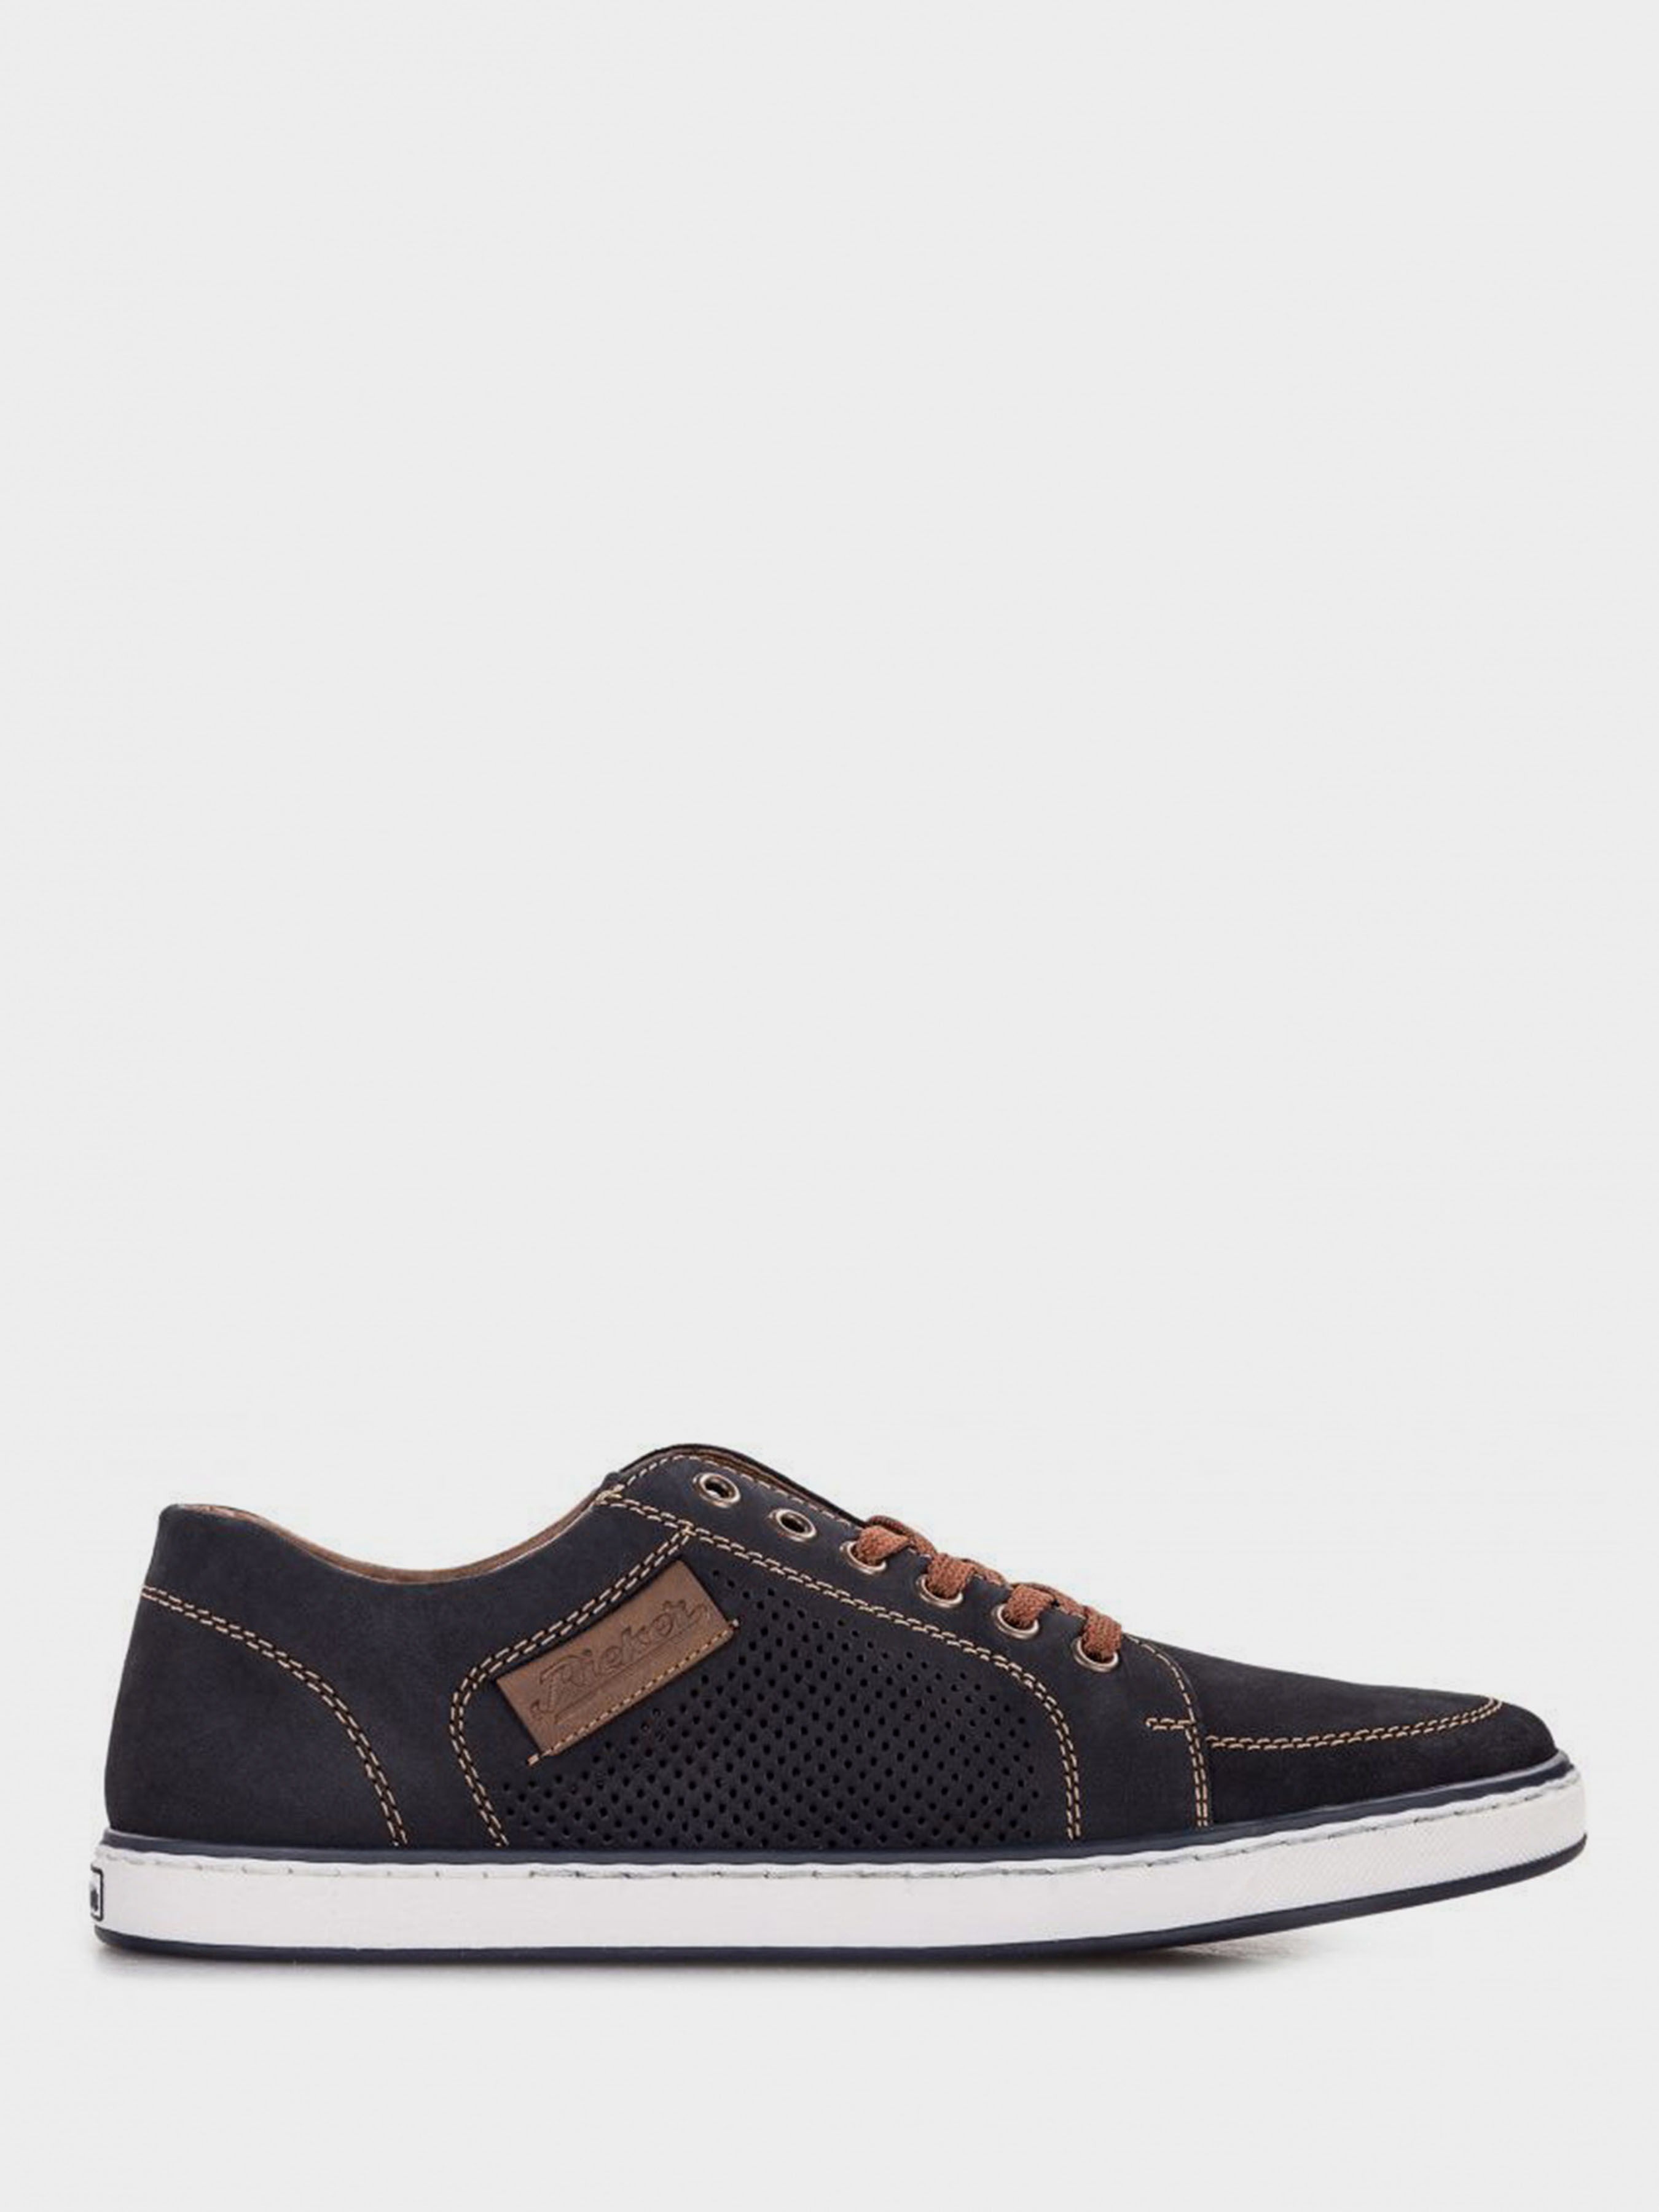 Полуботинки для мужчин RIEKER RK650 размеры обуви, 2017